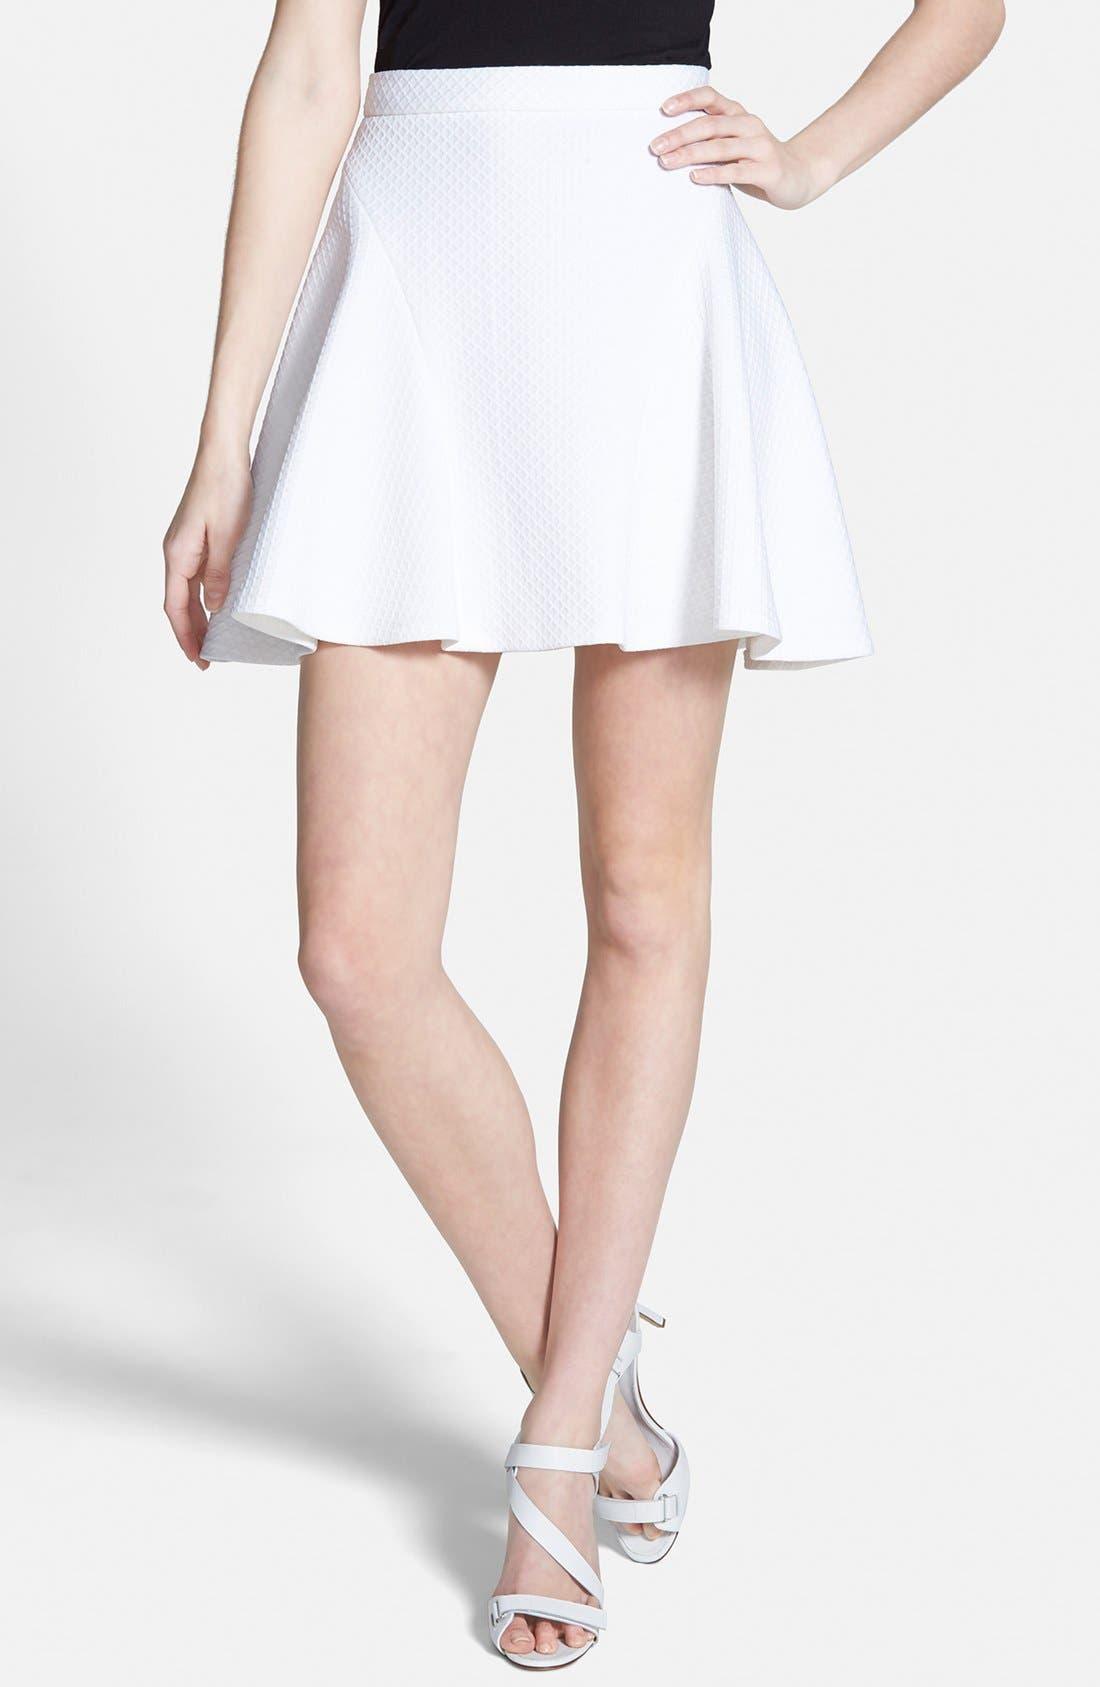 Alternate Image 1 Selected - Rebecca Minkoff 'Jax' Flare Skirt